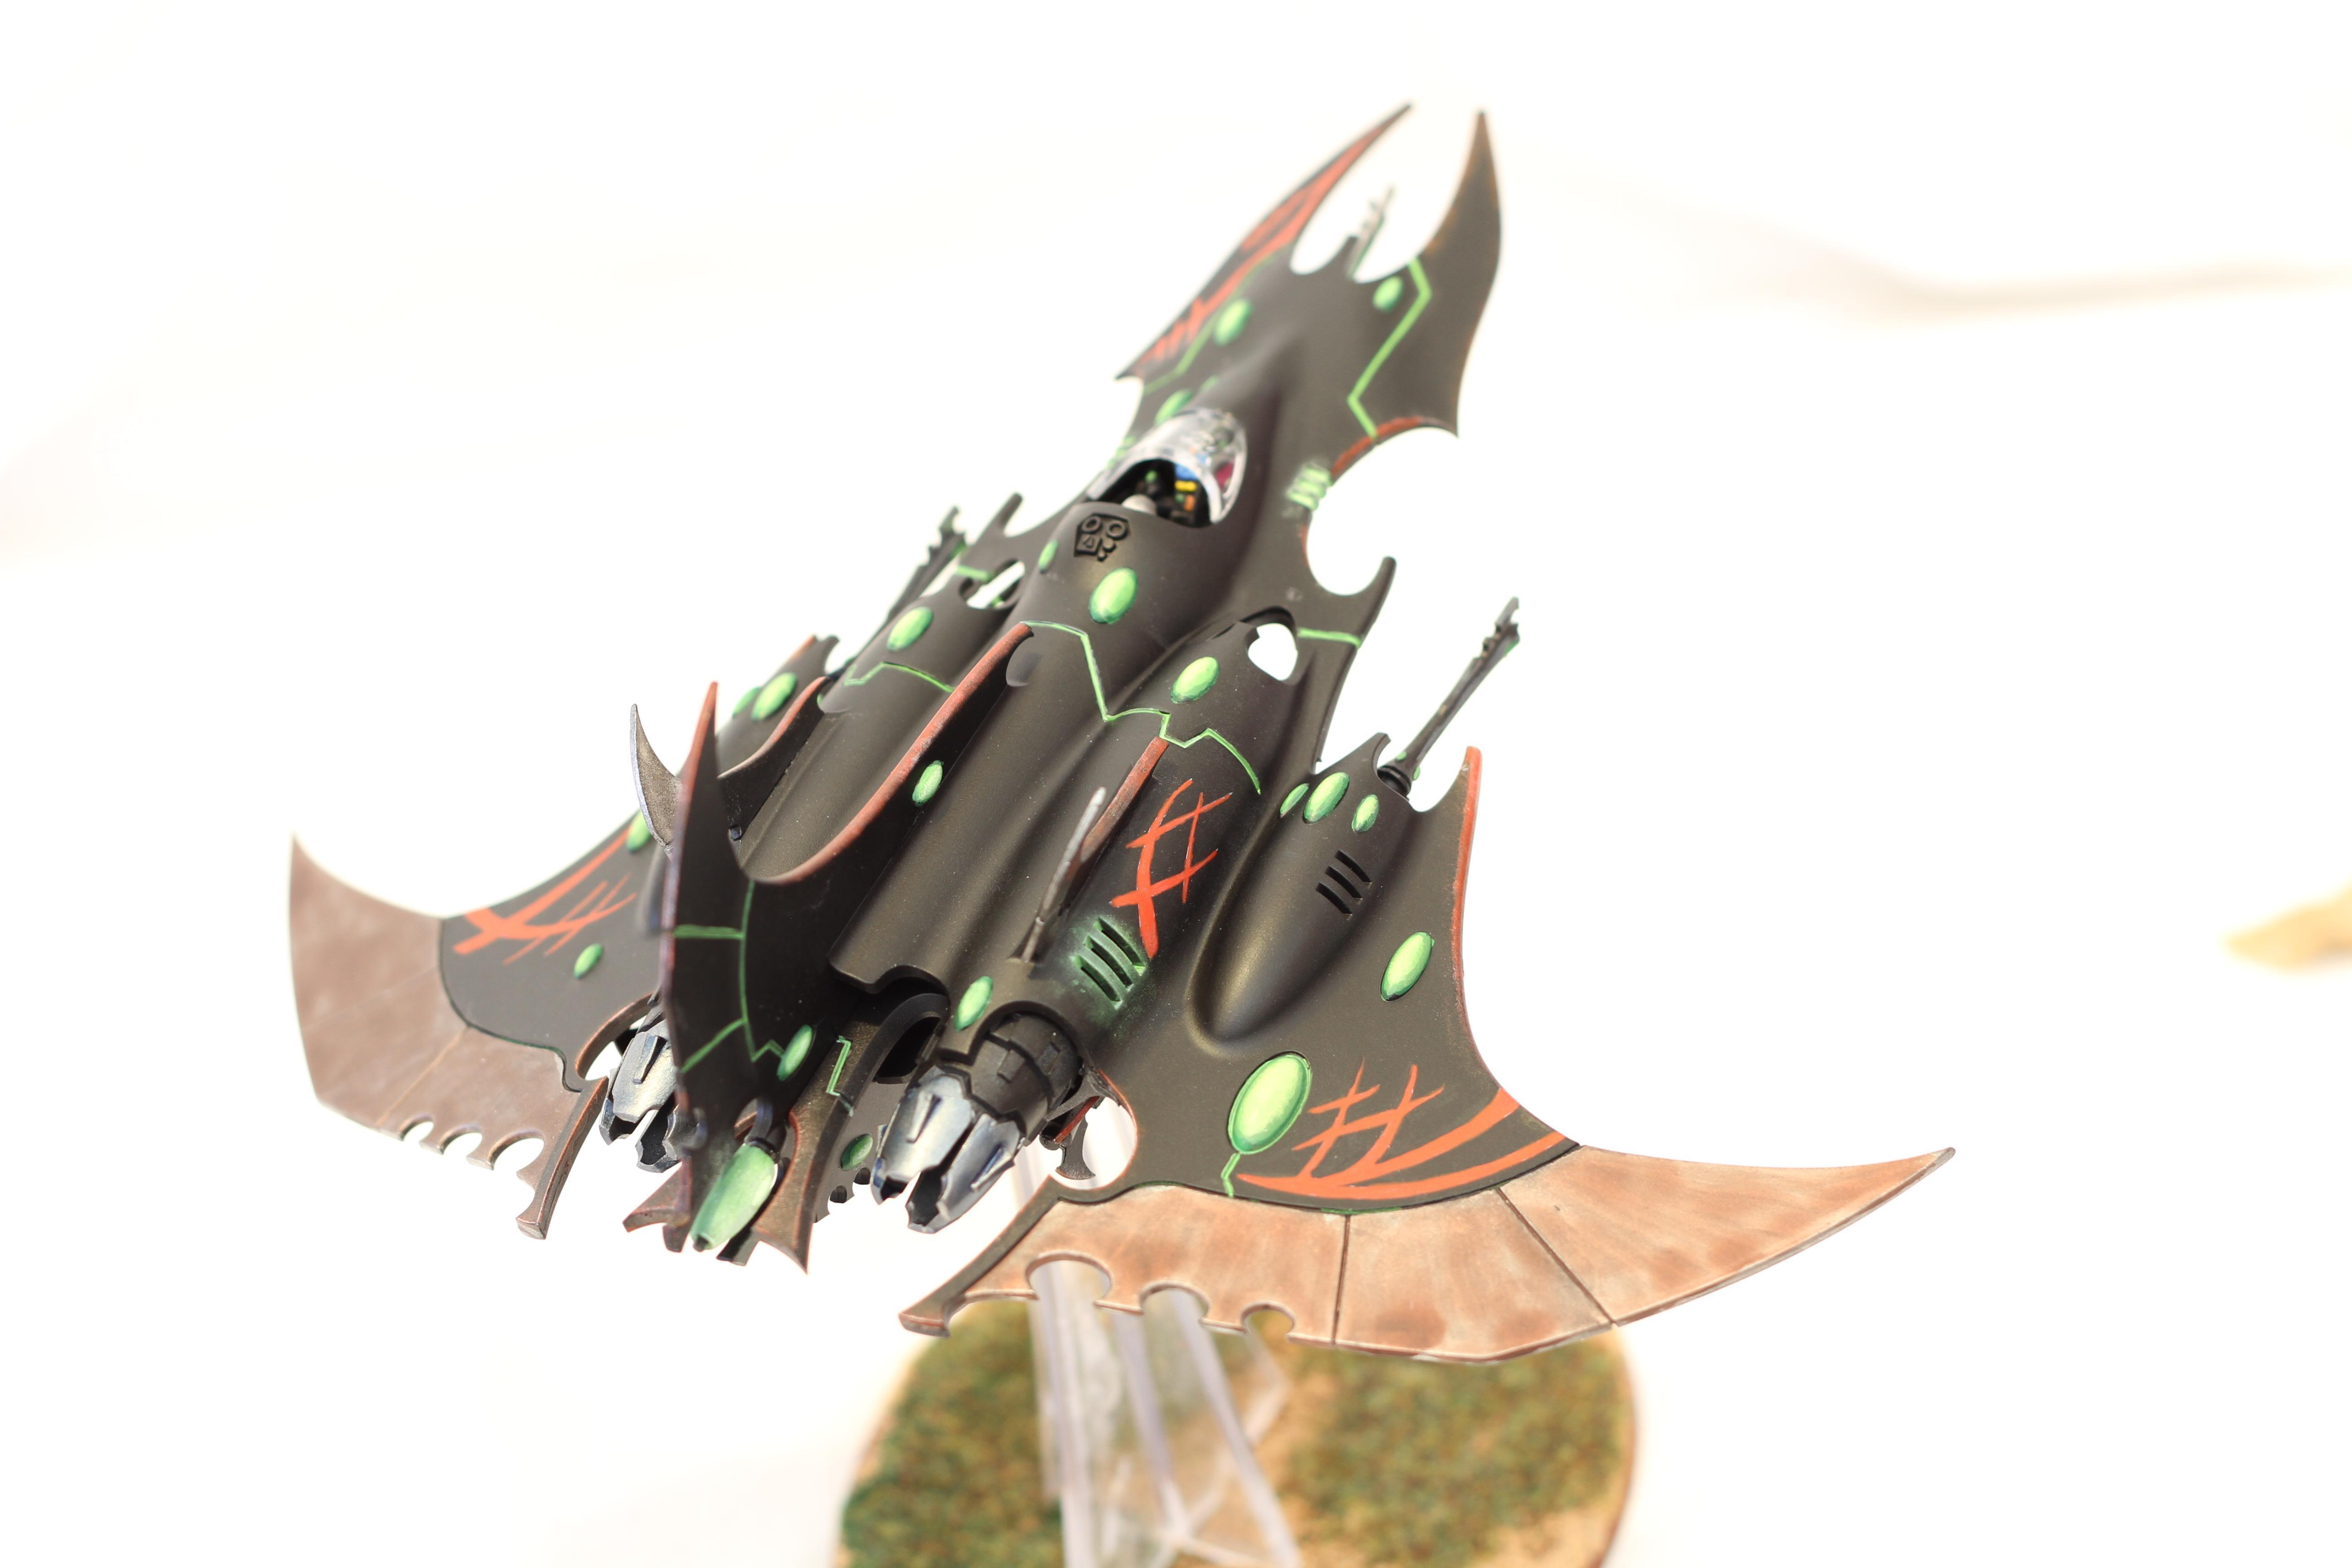 Black, Dark Eldar, De, Eldar, Heavy Support, Lance, One Shot, Razorwing, Razorwing Jetfighter, Red, Supersonic. Super Sonic